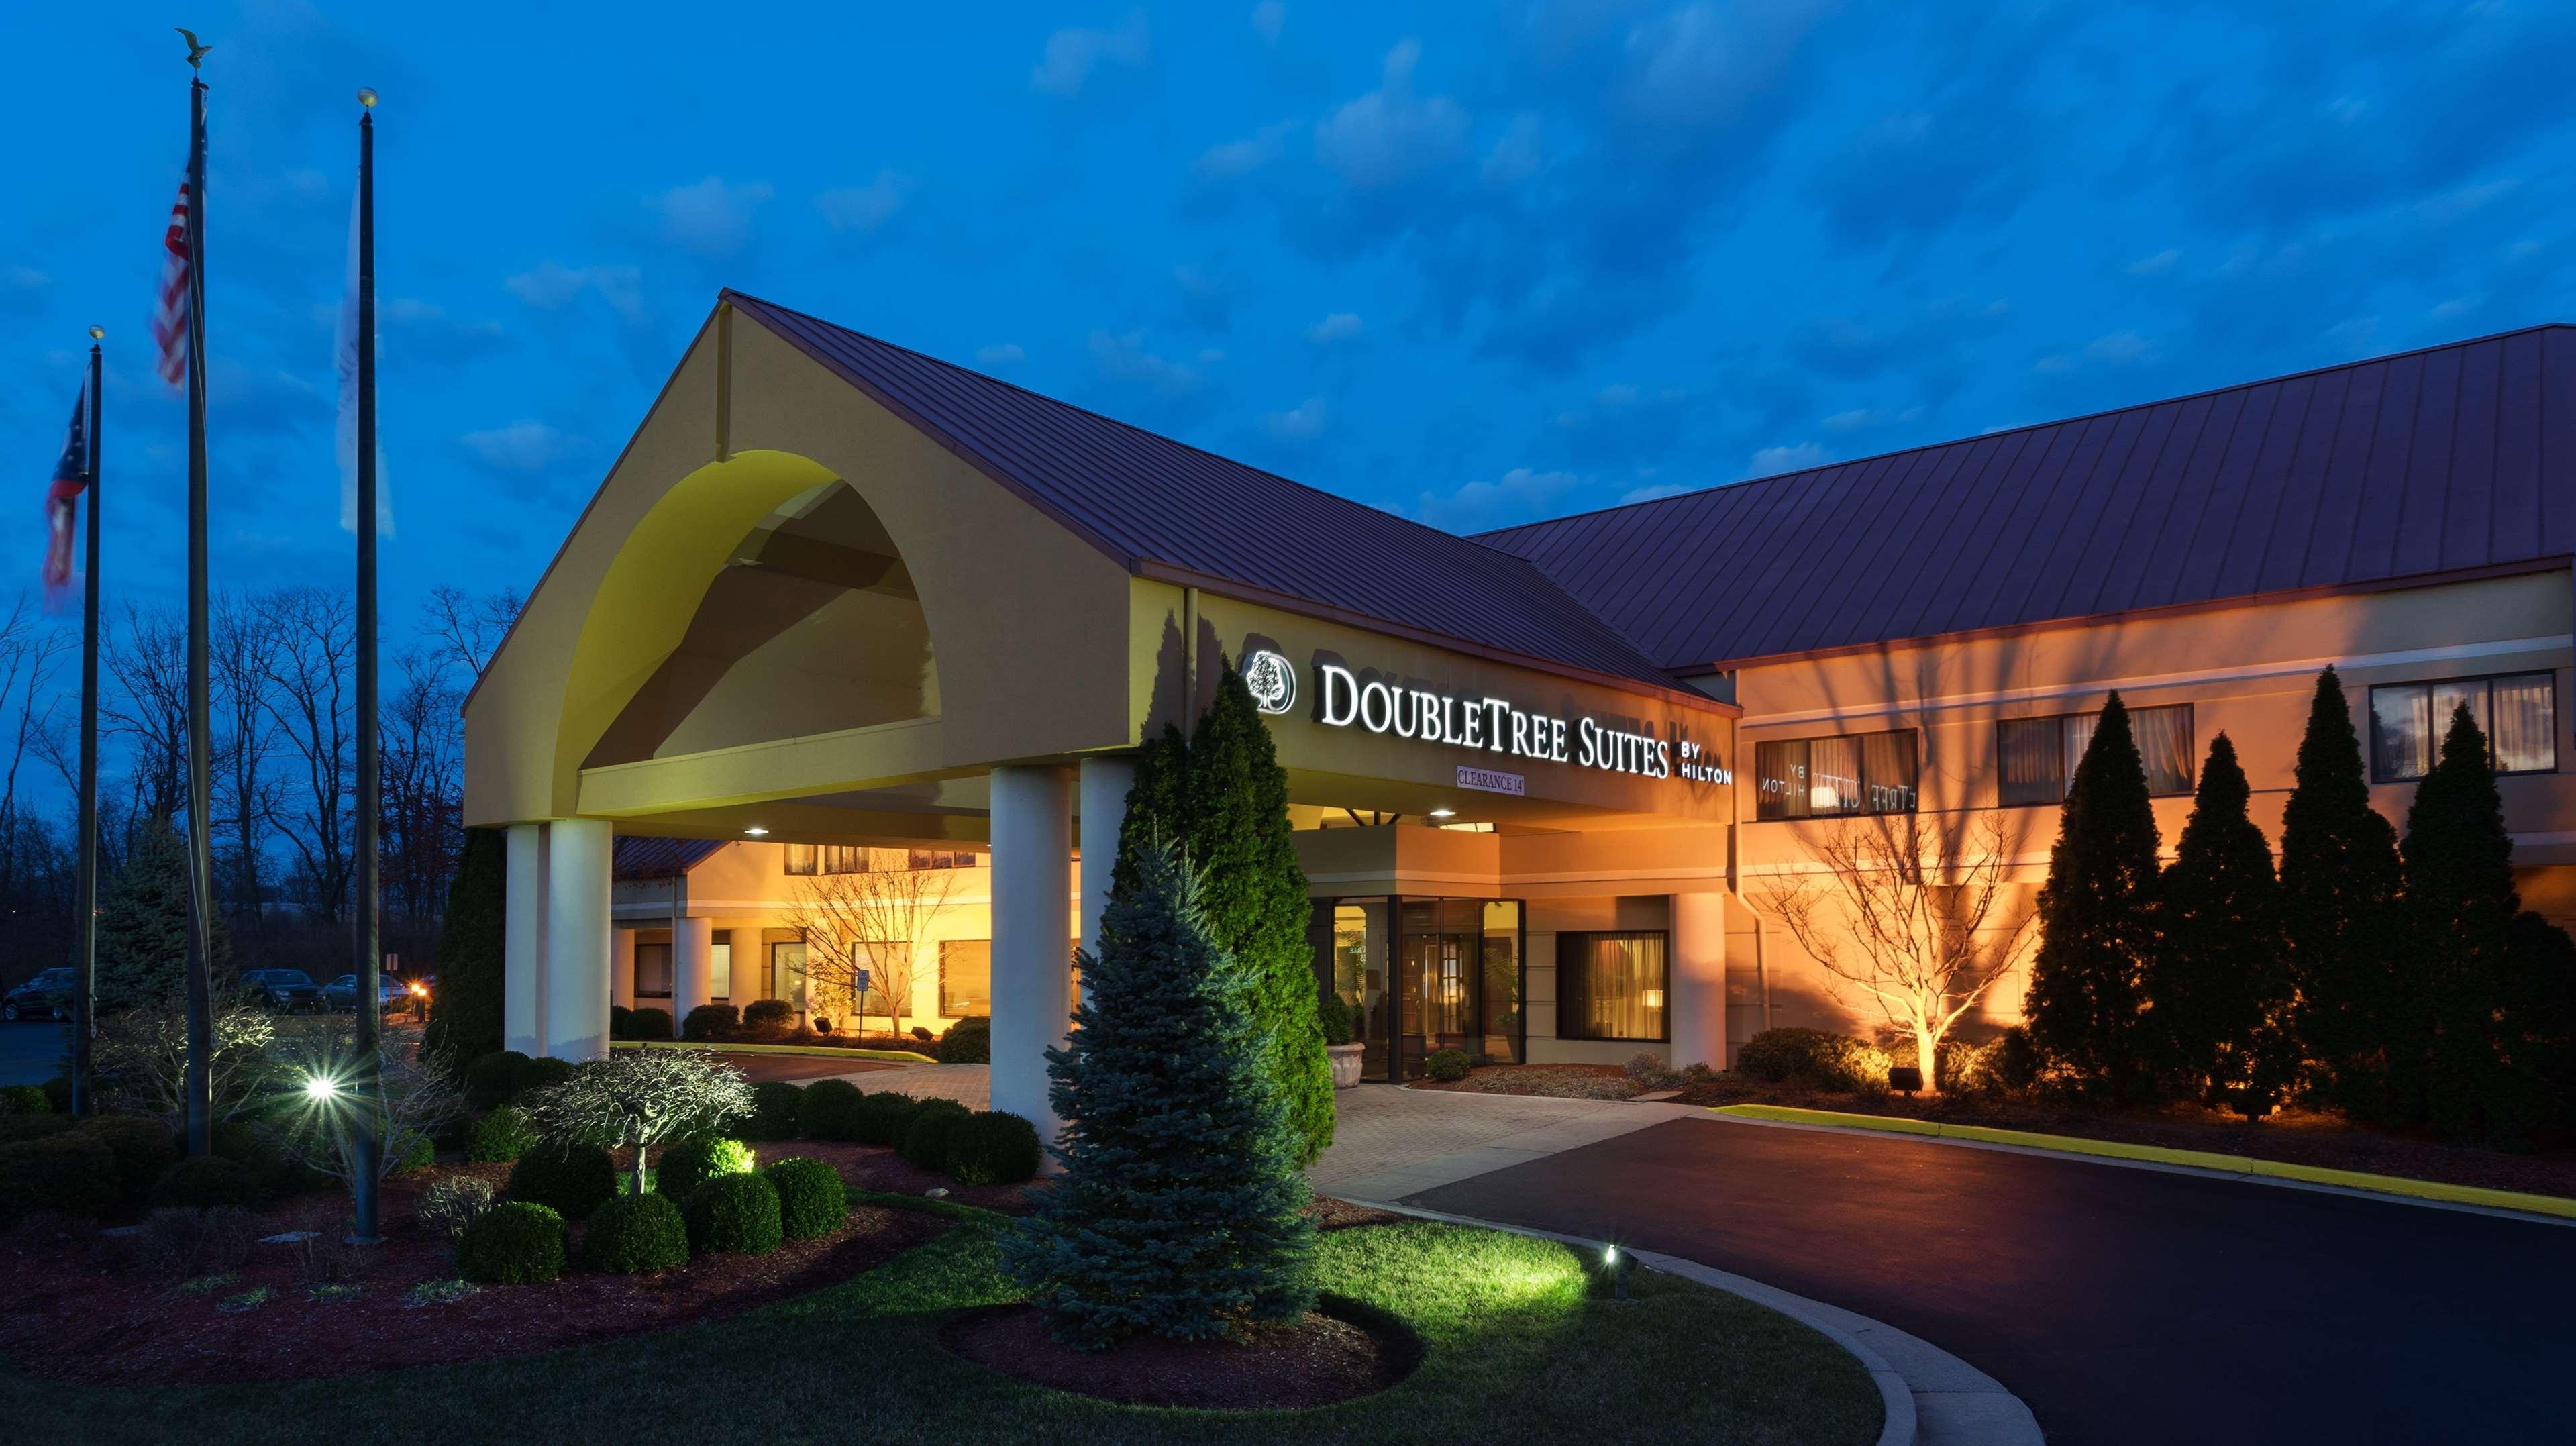 DoubleTree Suites by Hilton Hotel Cincinnati - Blue Ash image 0